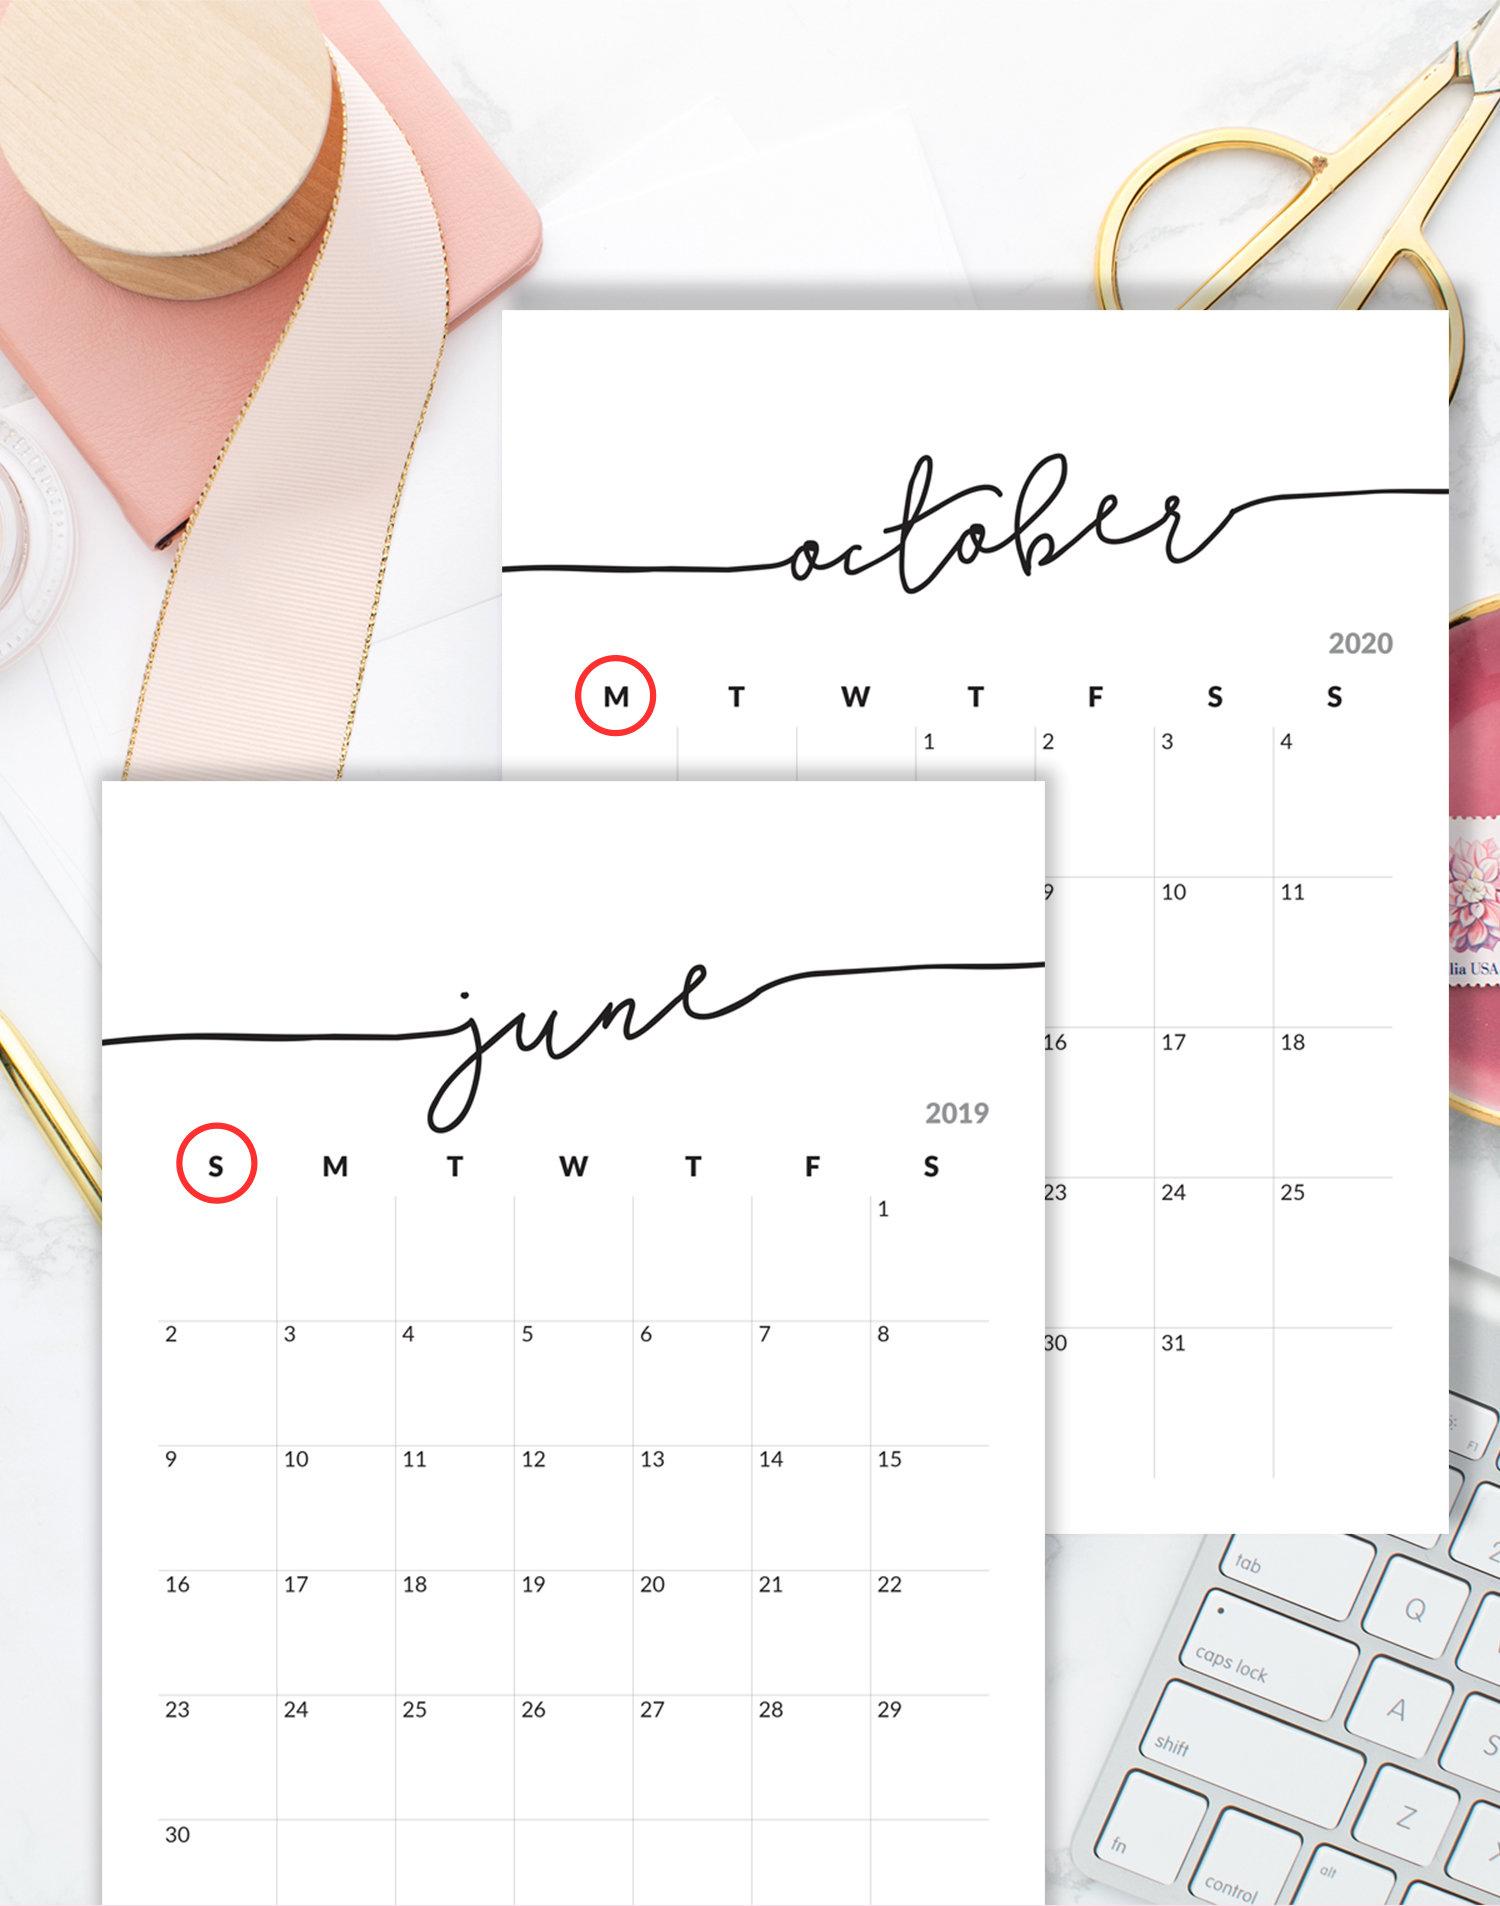 Printable calendar.jpg